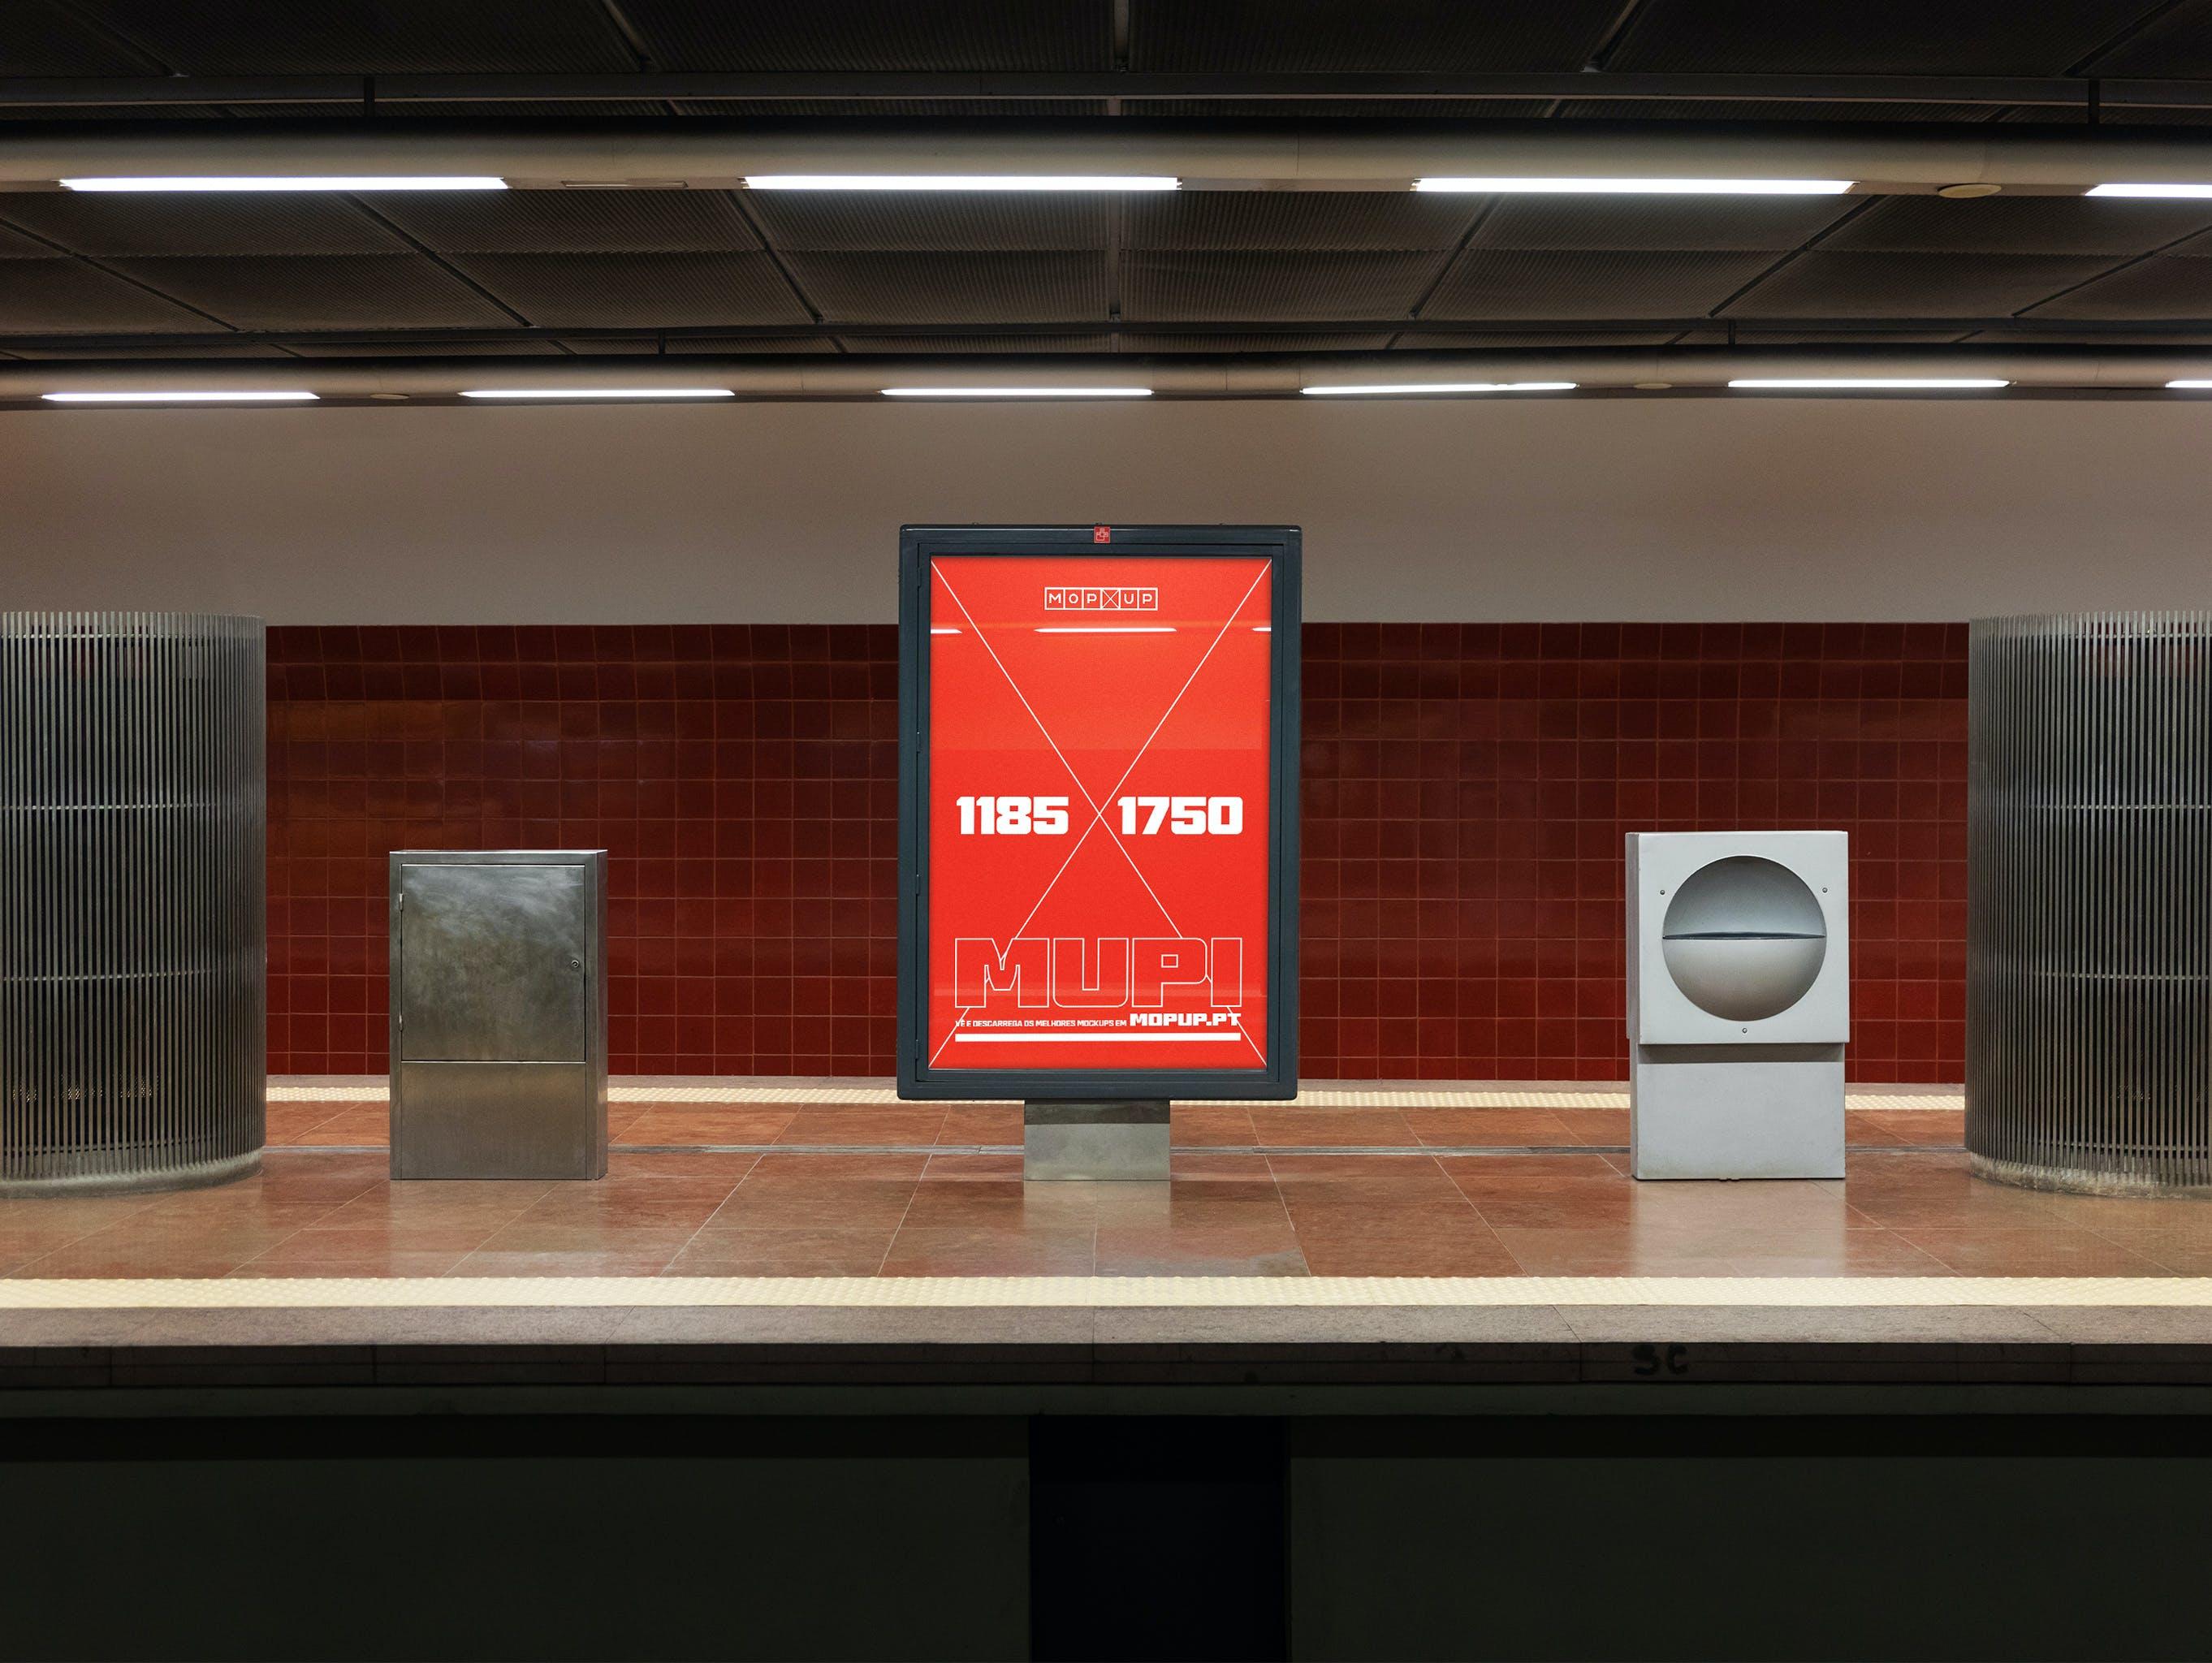 MOPUP - Mupi Metro Alvalade - Mockup